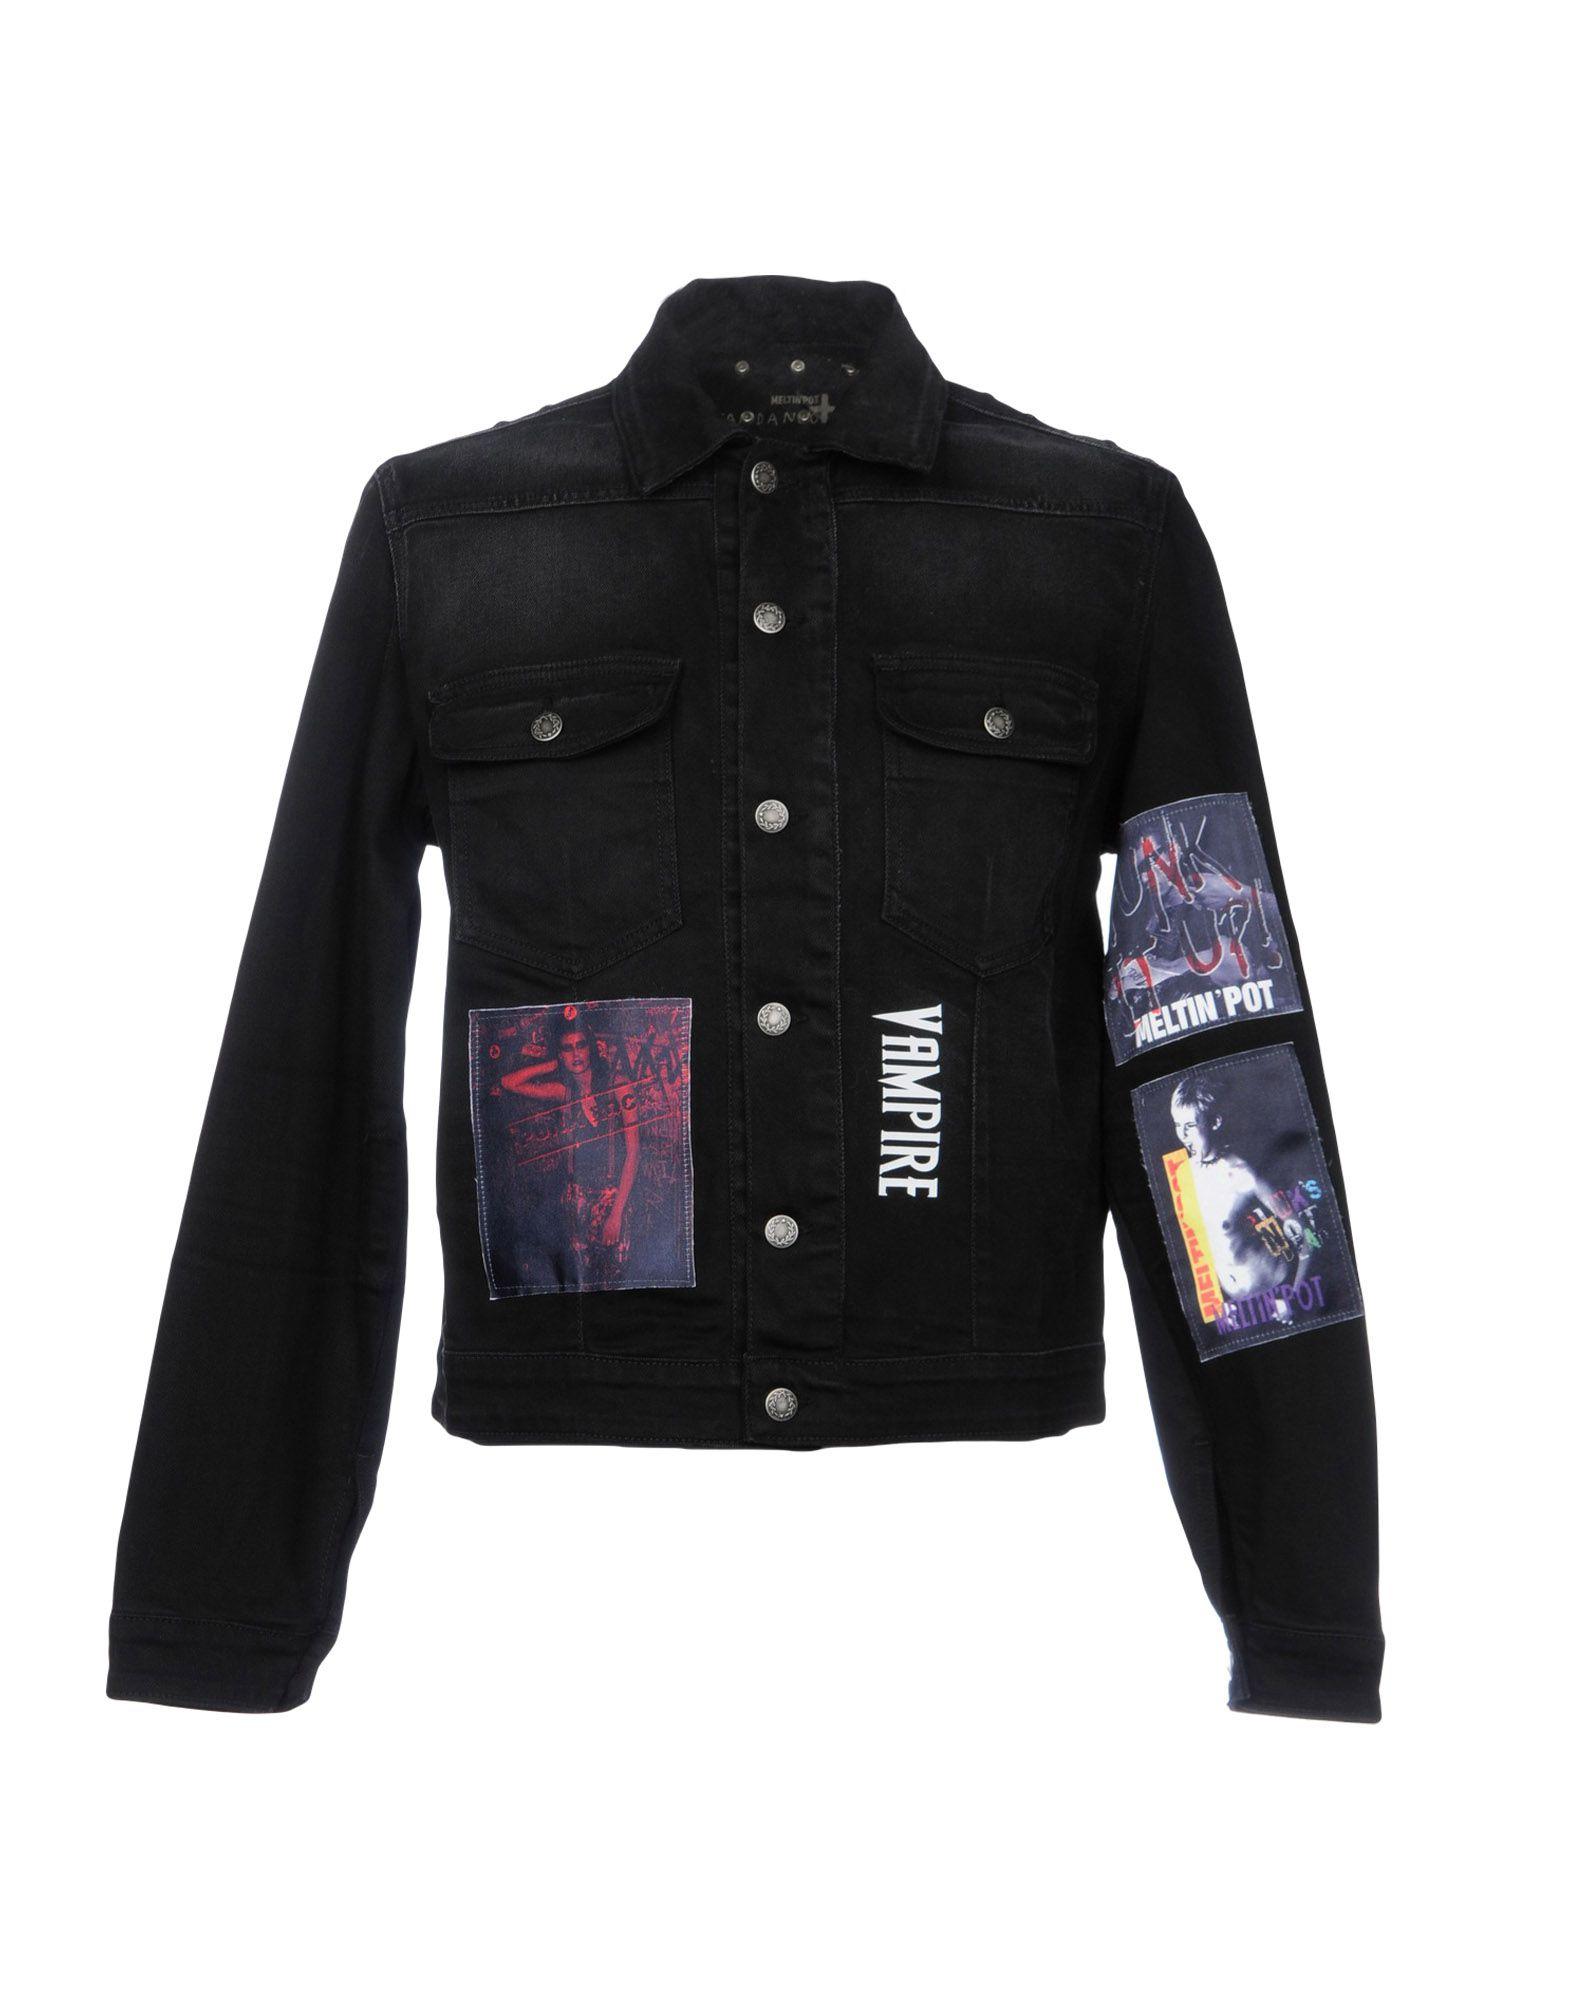 Giubbotto Jeans Meltin Pot Uomo - Acquista online su